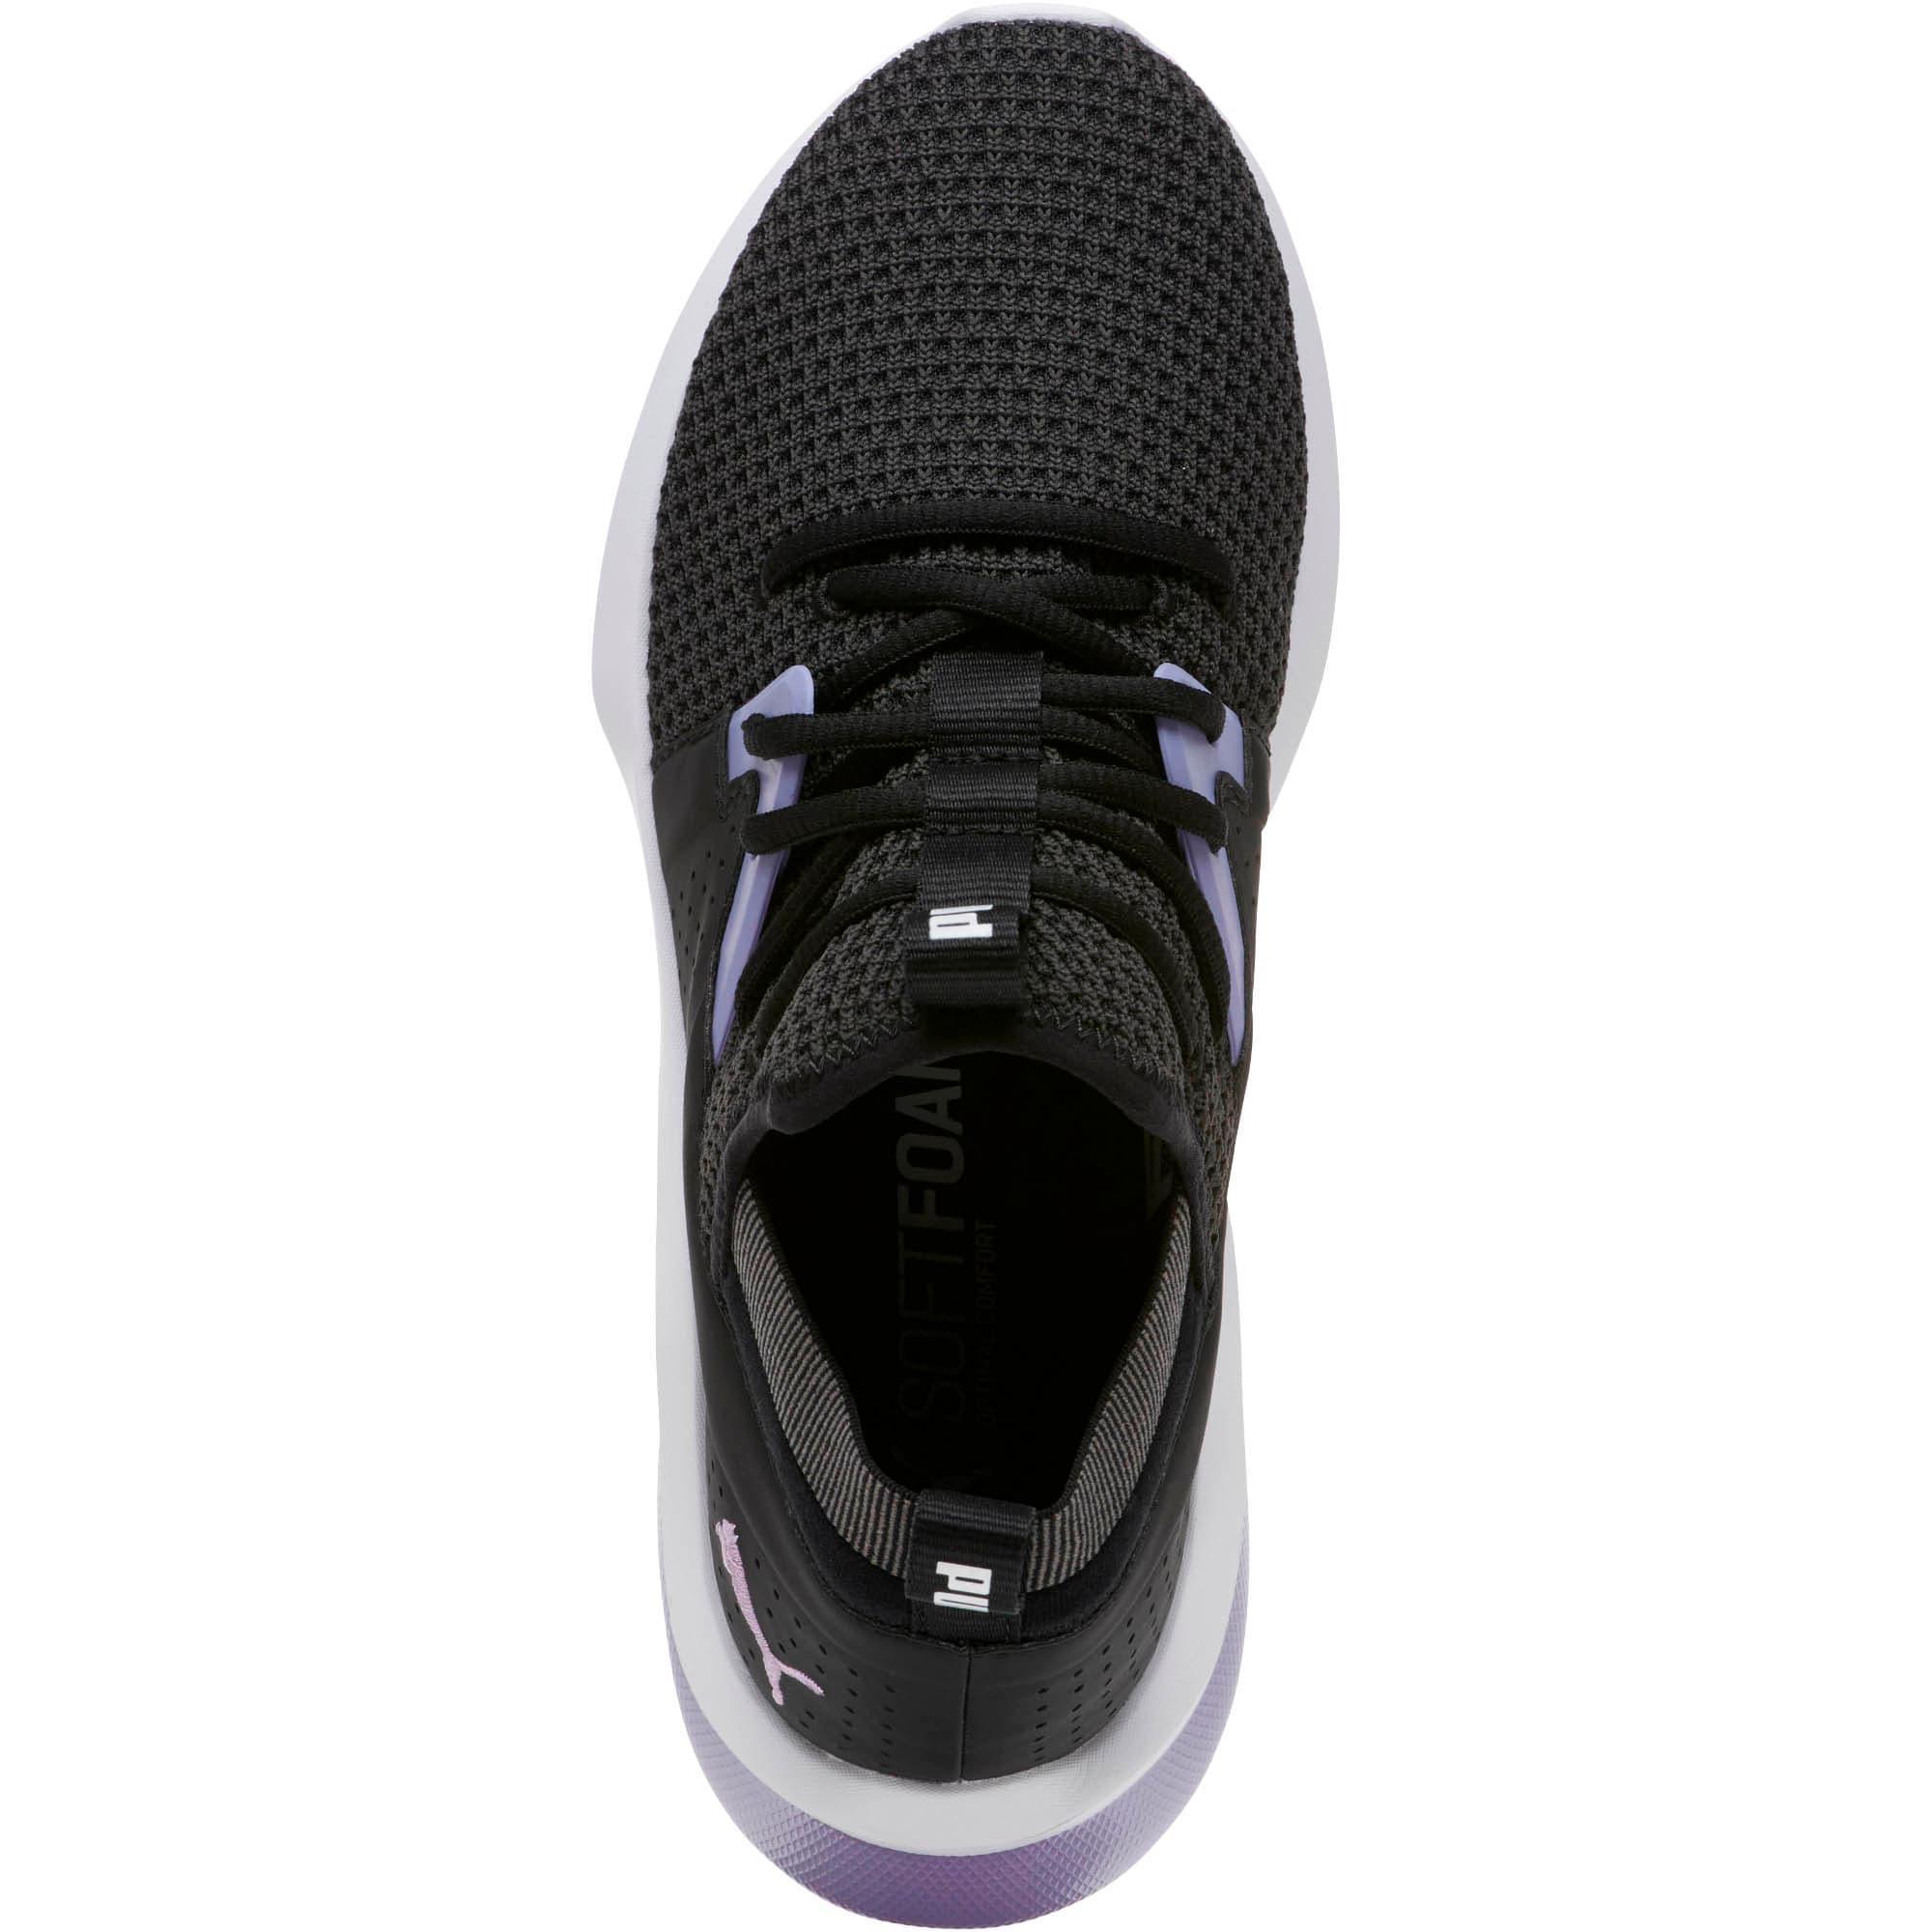 Thumbnail 5 of Emergence Cosmic Women's Sneakers, Puma Black-Sweet Lavender, medium